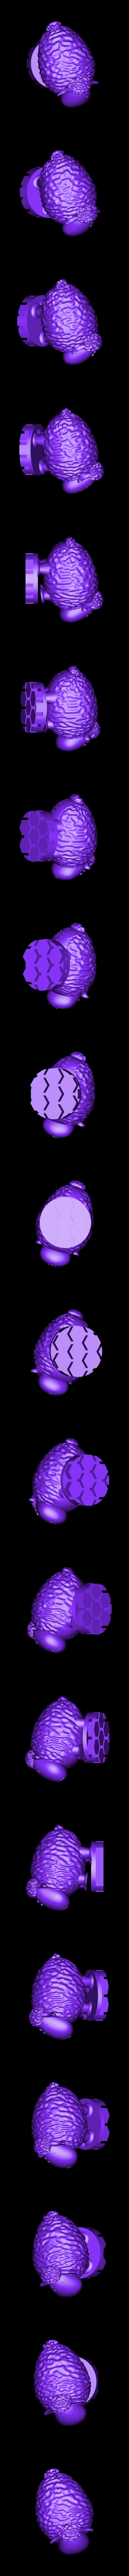 Zoetrope_Prusament Spool_by Dominik Cisar_Sheep 06.stl Download free STL file SPIROGRAPH - PRUSAMENT SPOOL - reuse idea • 3D print model, cisardom